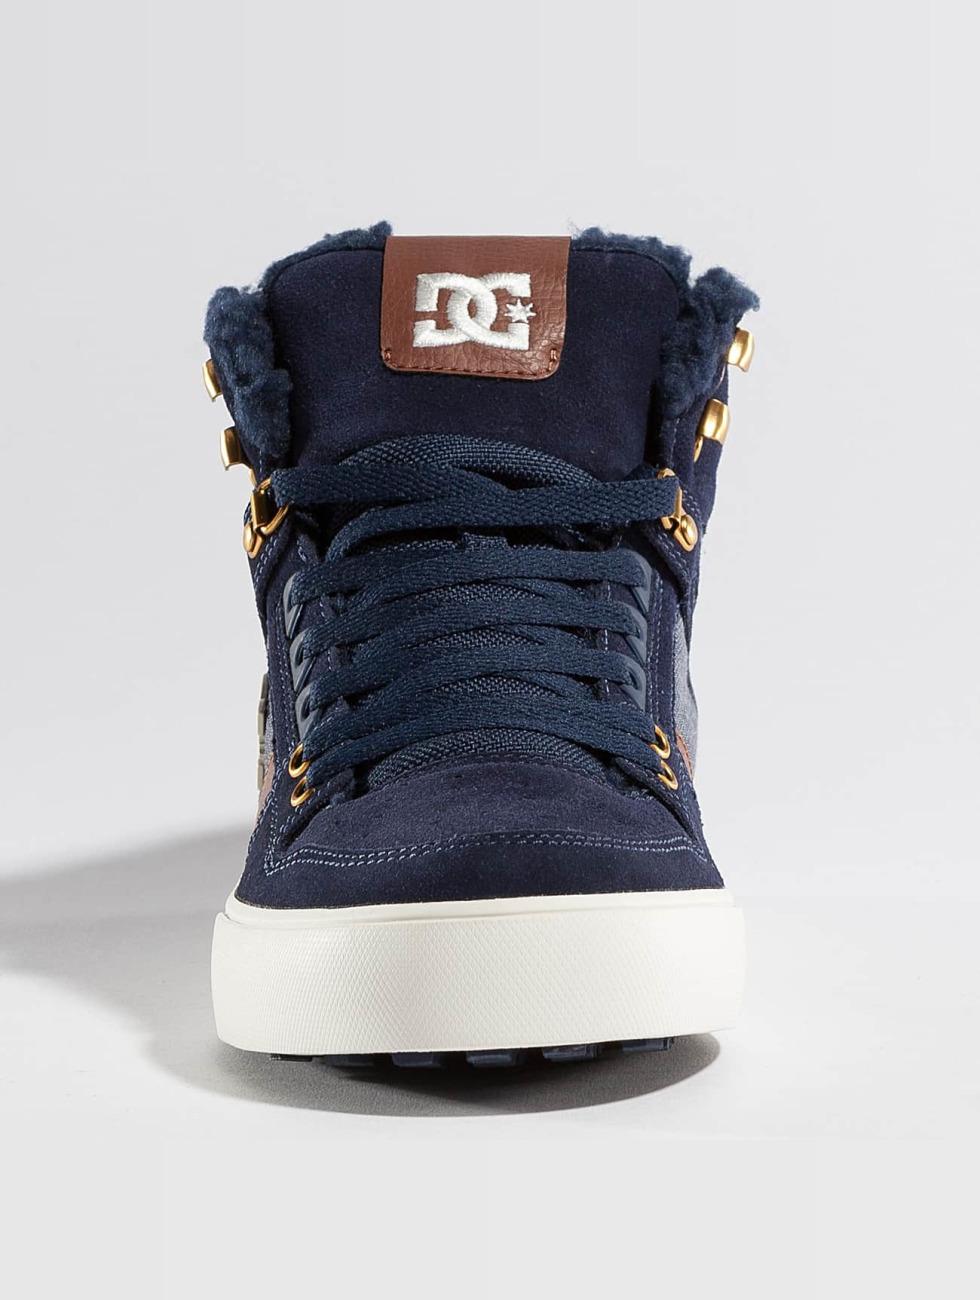 Dc Pattino / Sneaker Spartano Wnt Alta Igienica In Blu 337.746 Jy94DjJ4